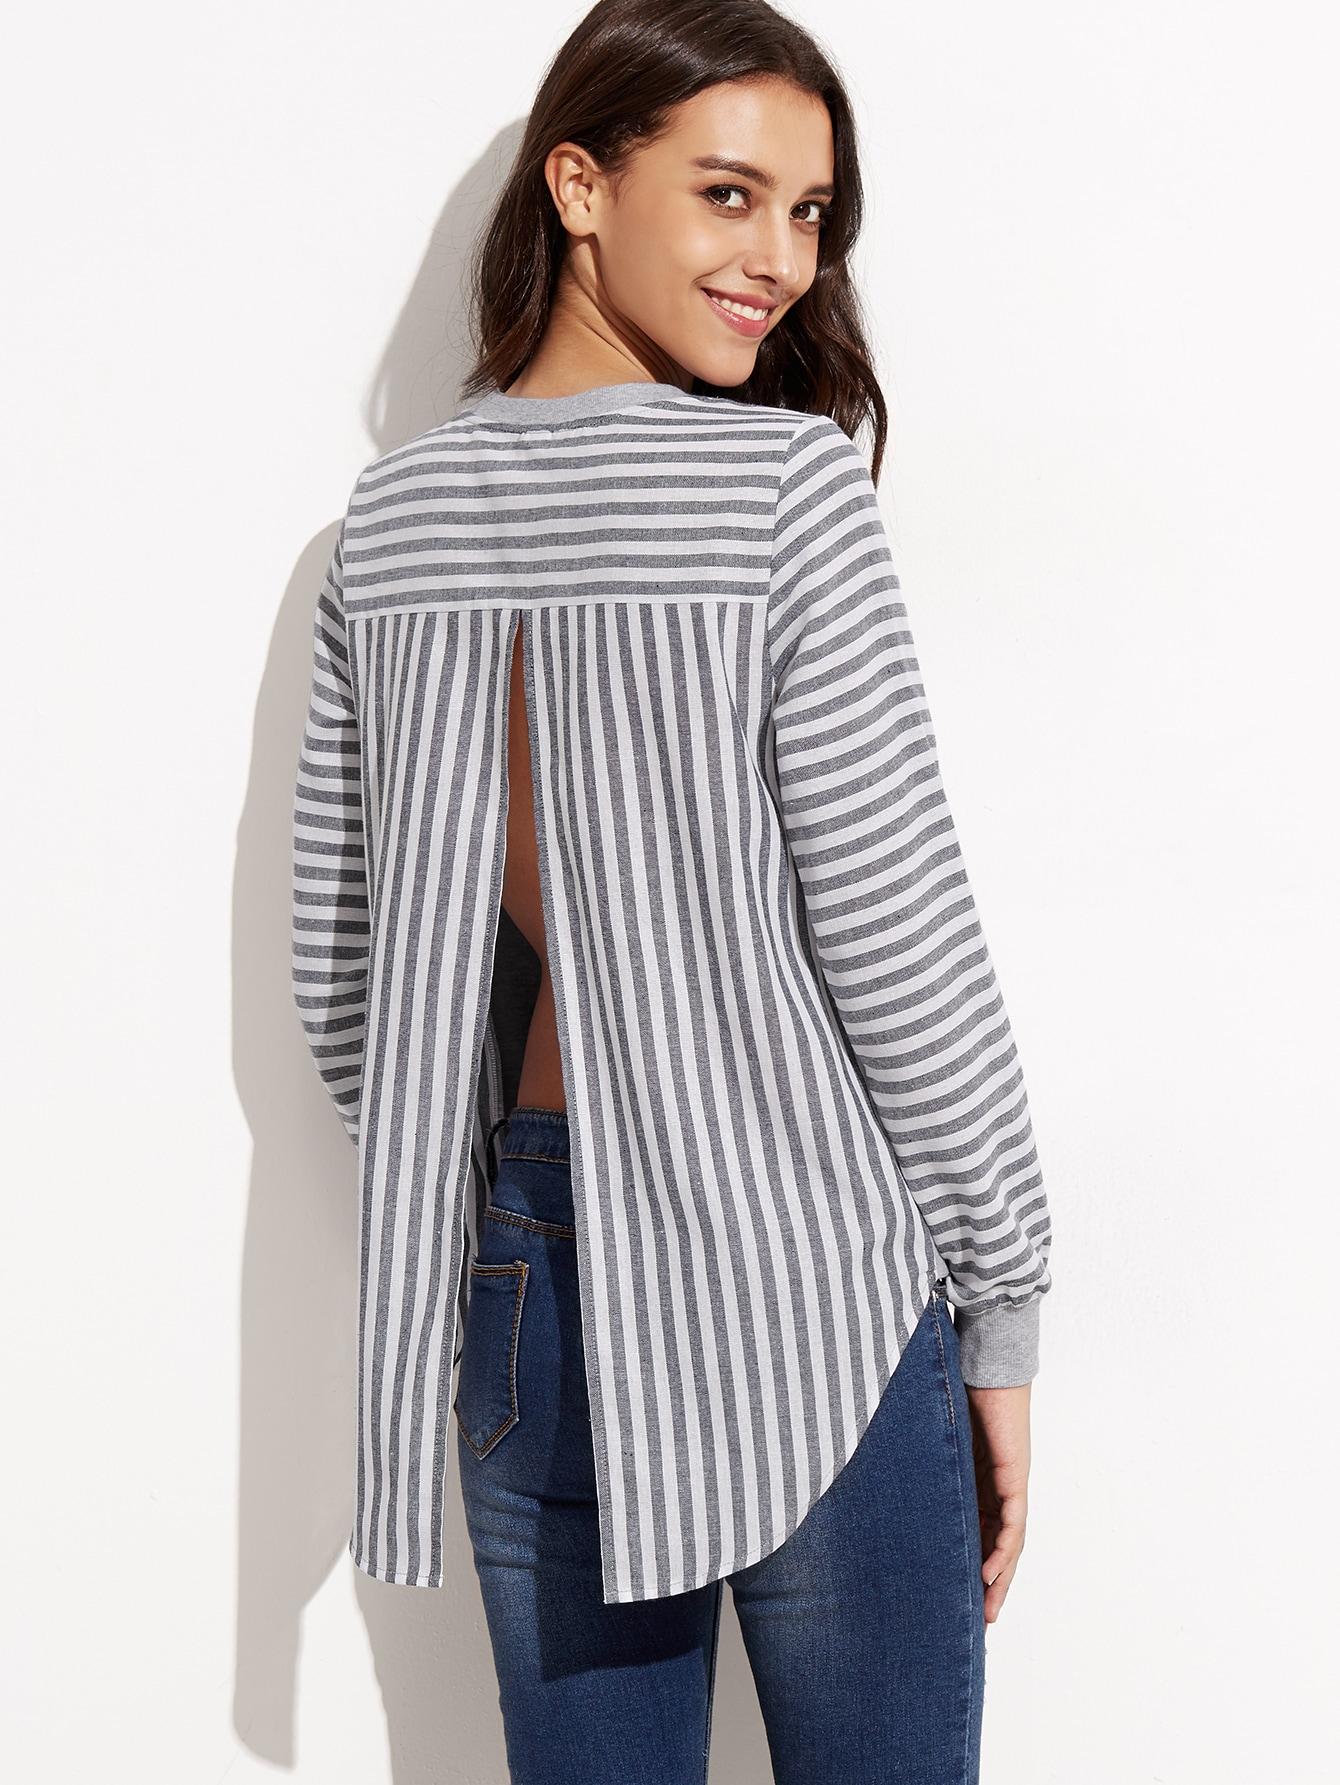 Grey Mixed Media Striped Split Back SweatshirtGrey Mixed Media Striped Split Back Sweatshirt<br><br>color: Grey<br>size: L,M,S,XS